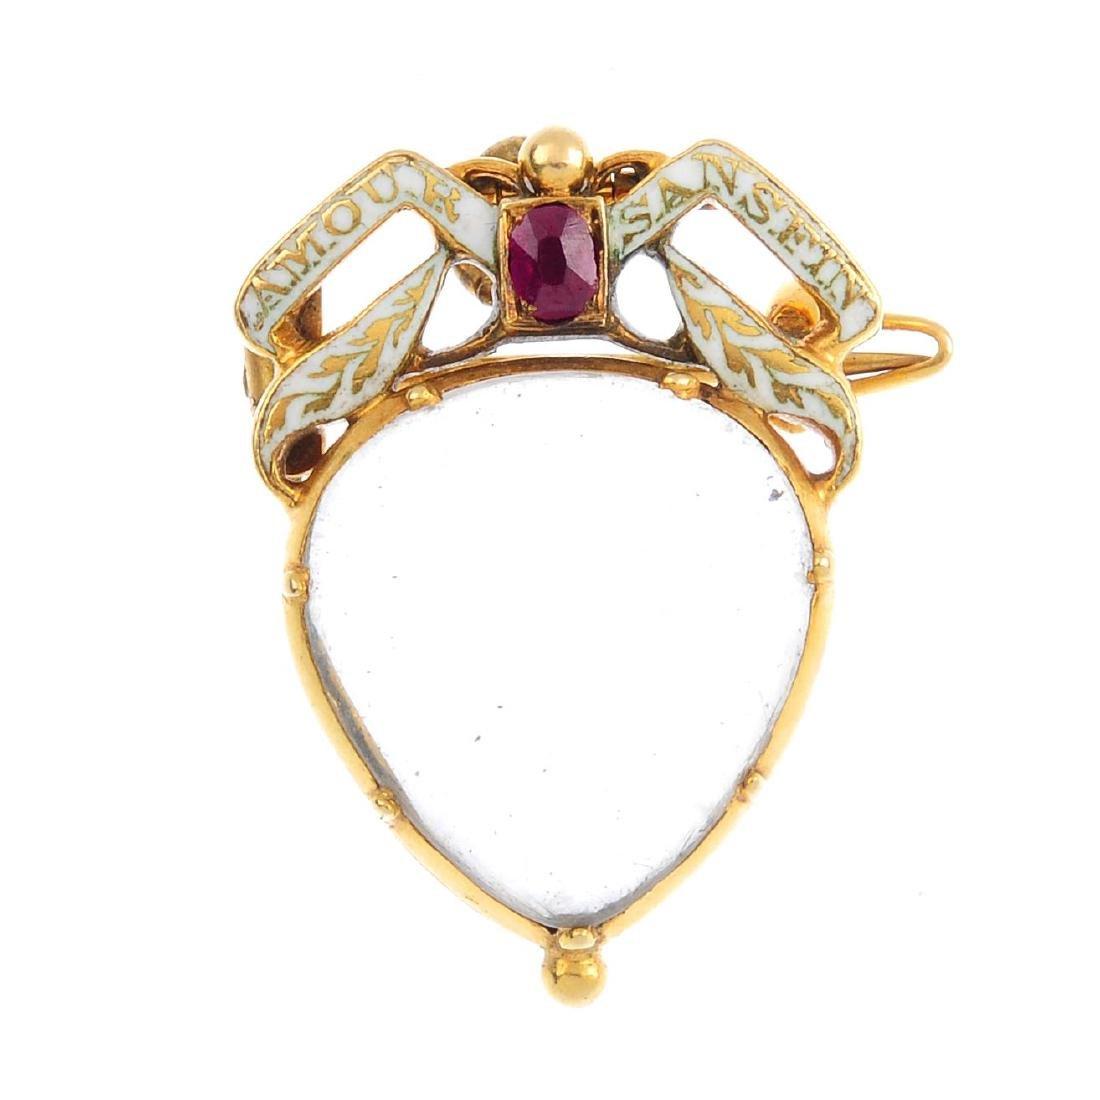 A late Georgian sentimental gold, enamel and gem-set